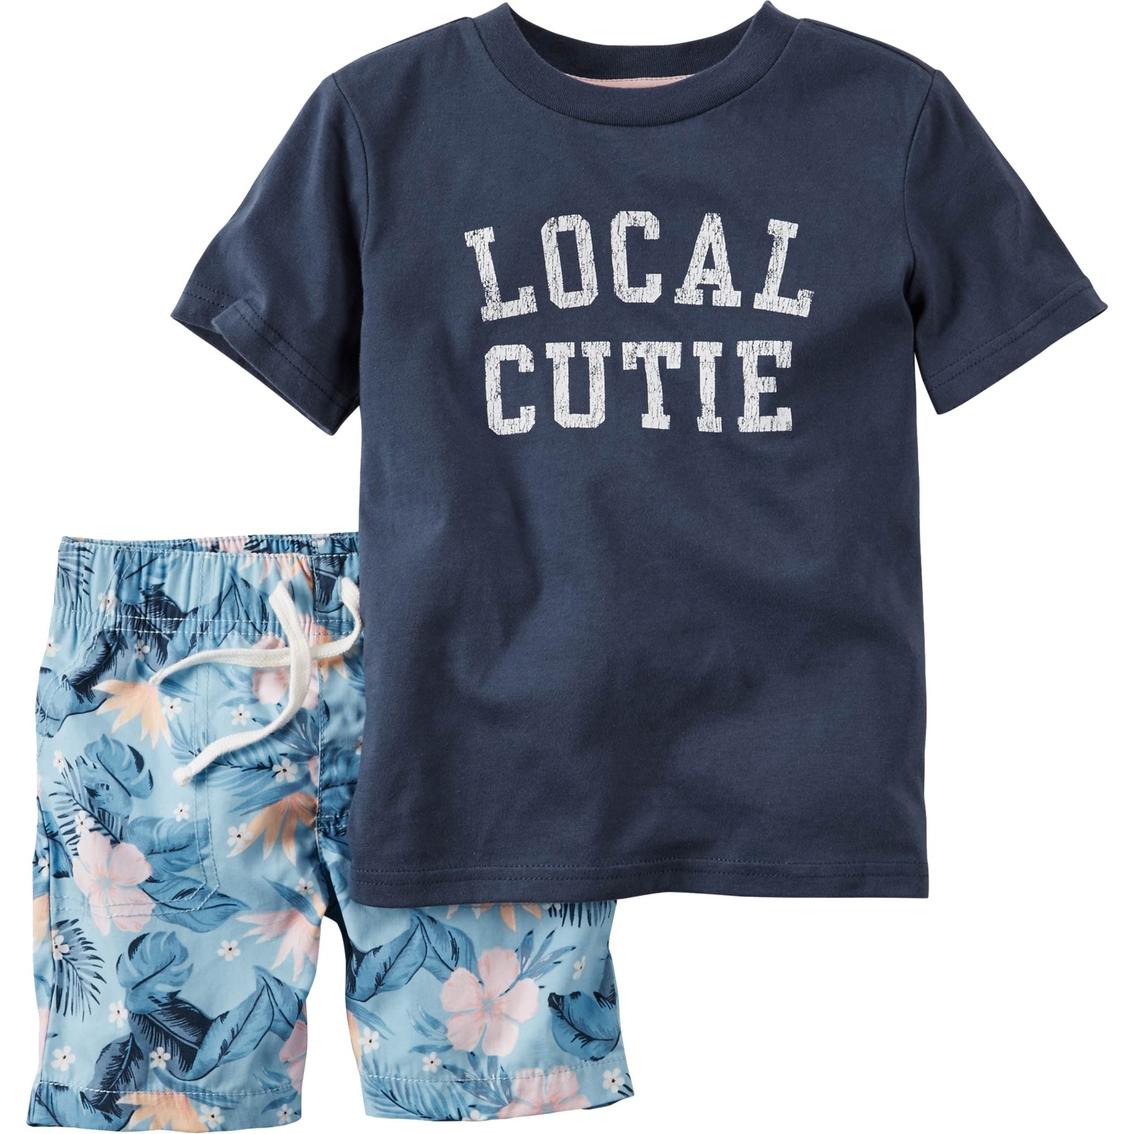 Polo Baby Clothes Boy Toffee Art